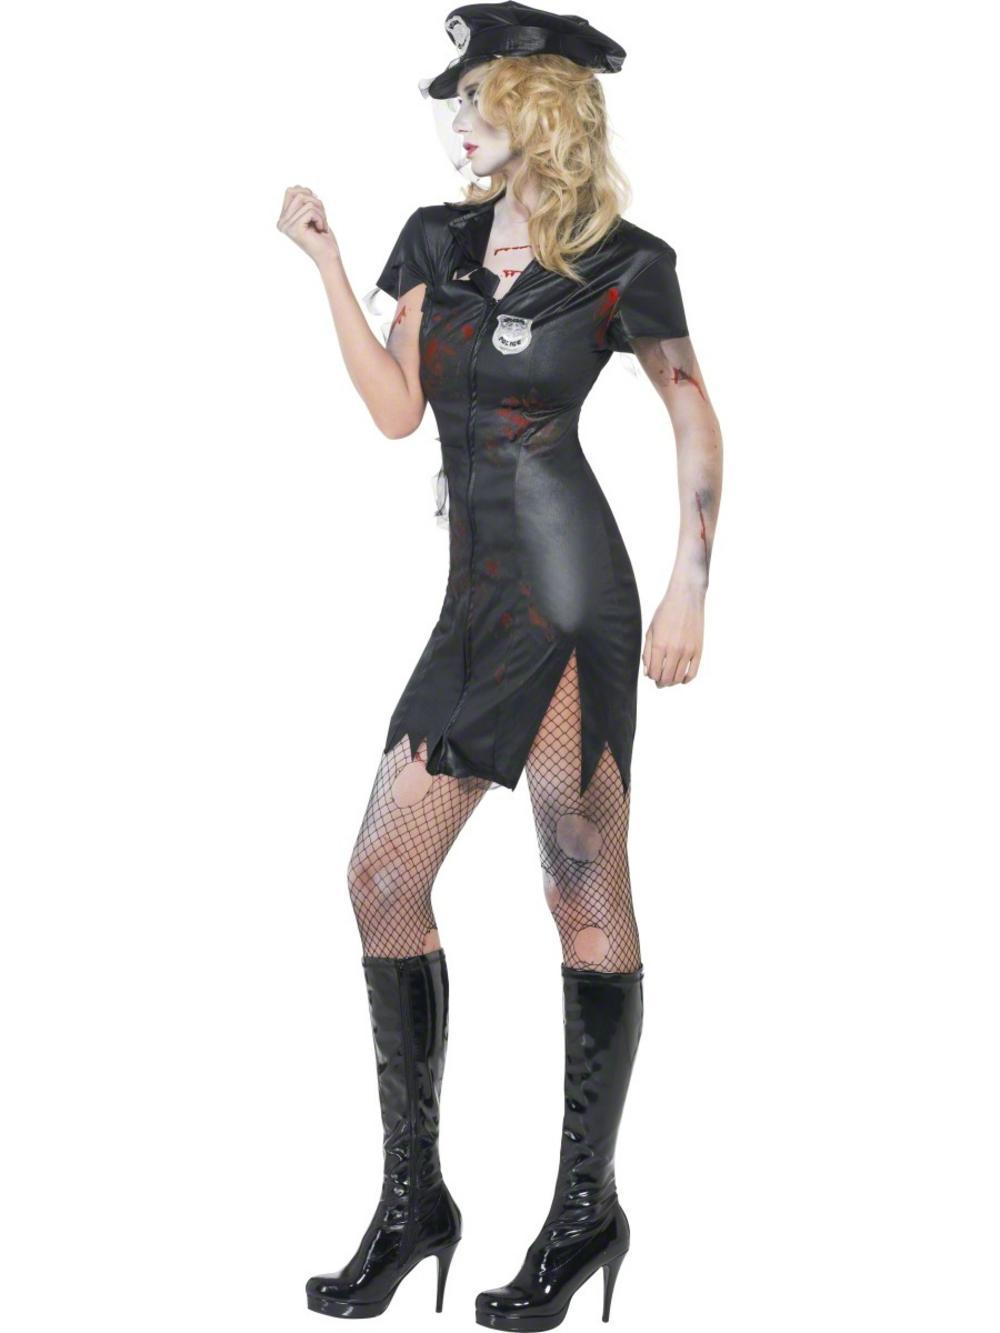 fever zombie cop costume | all ladies halloween costumes | mega